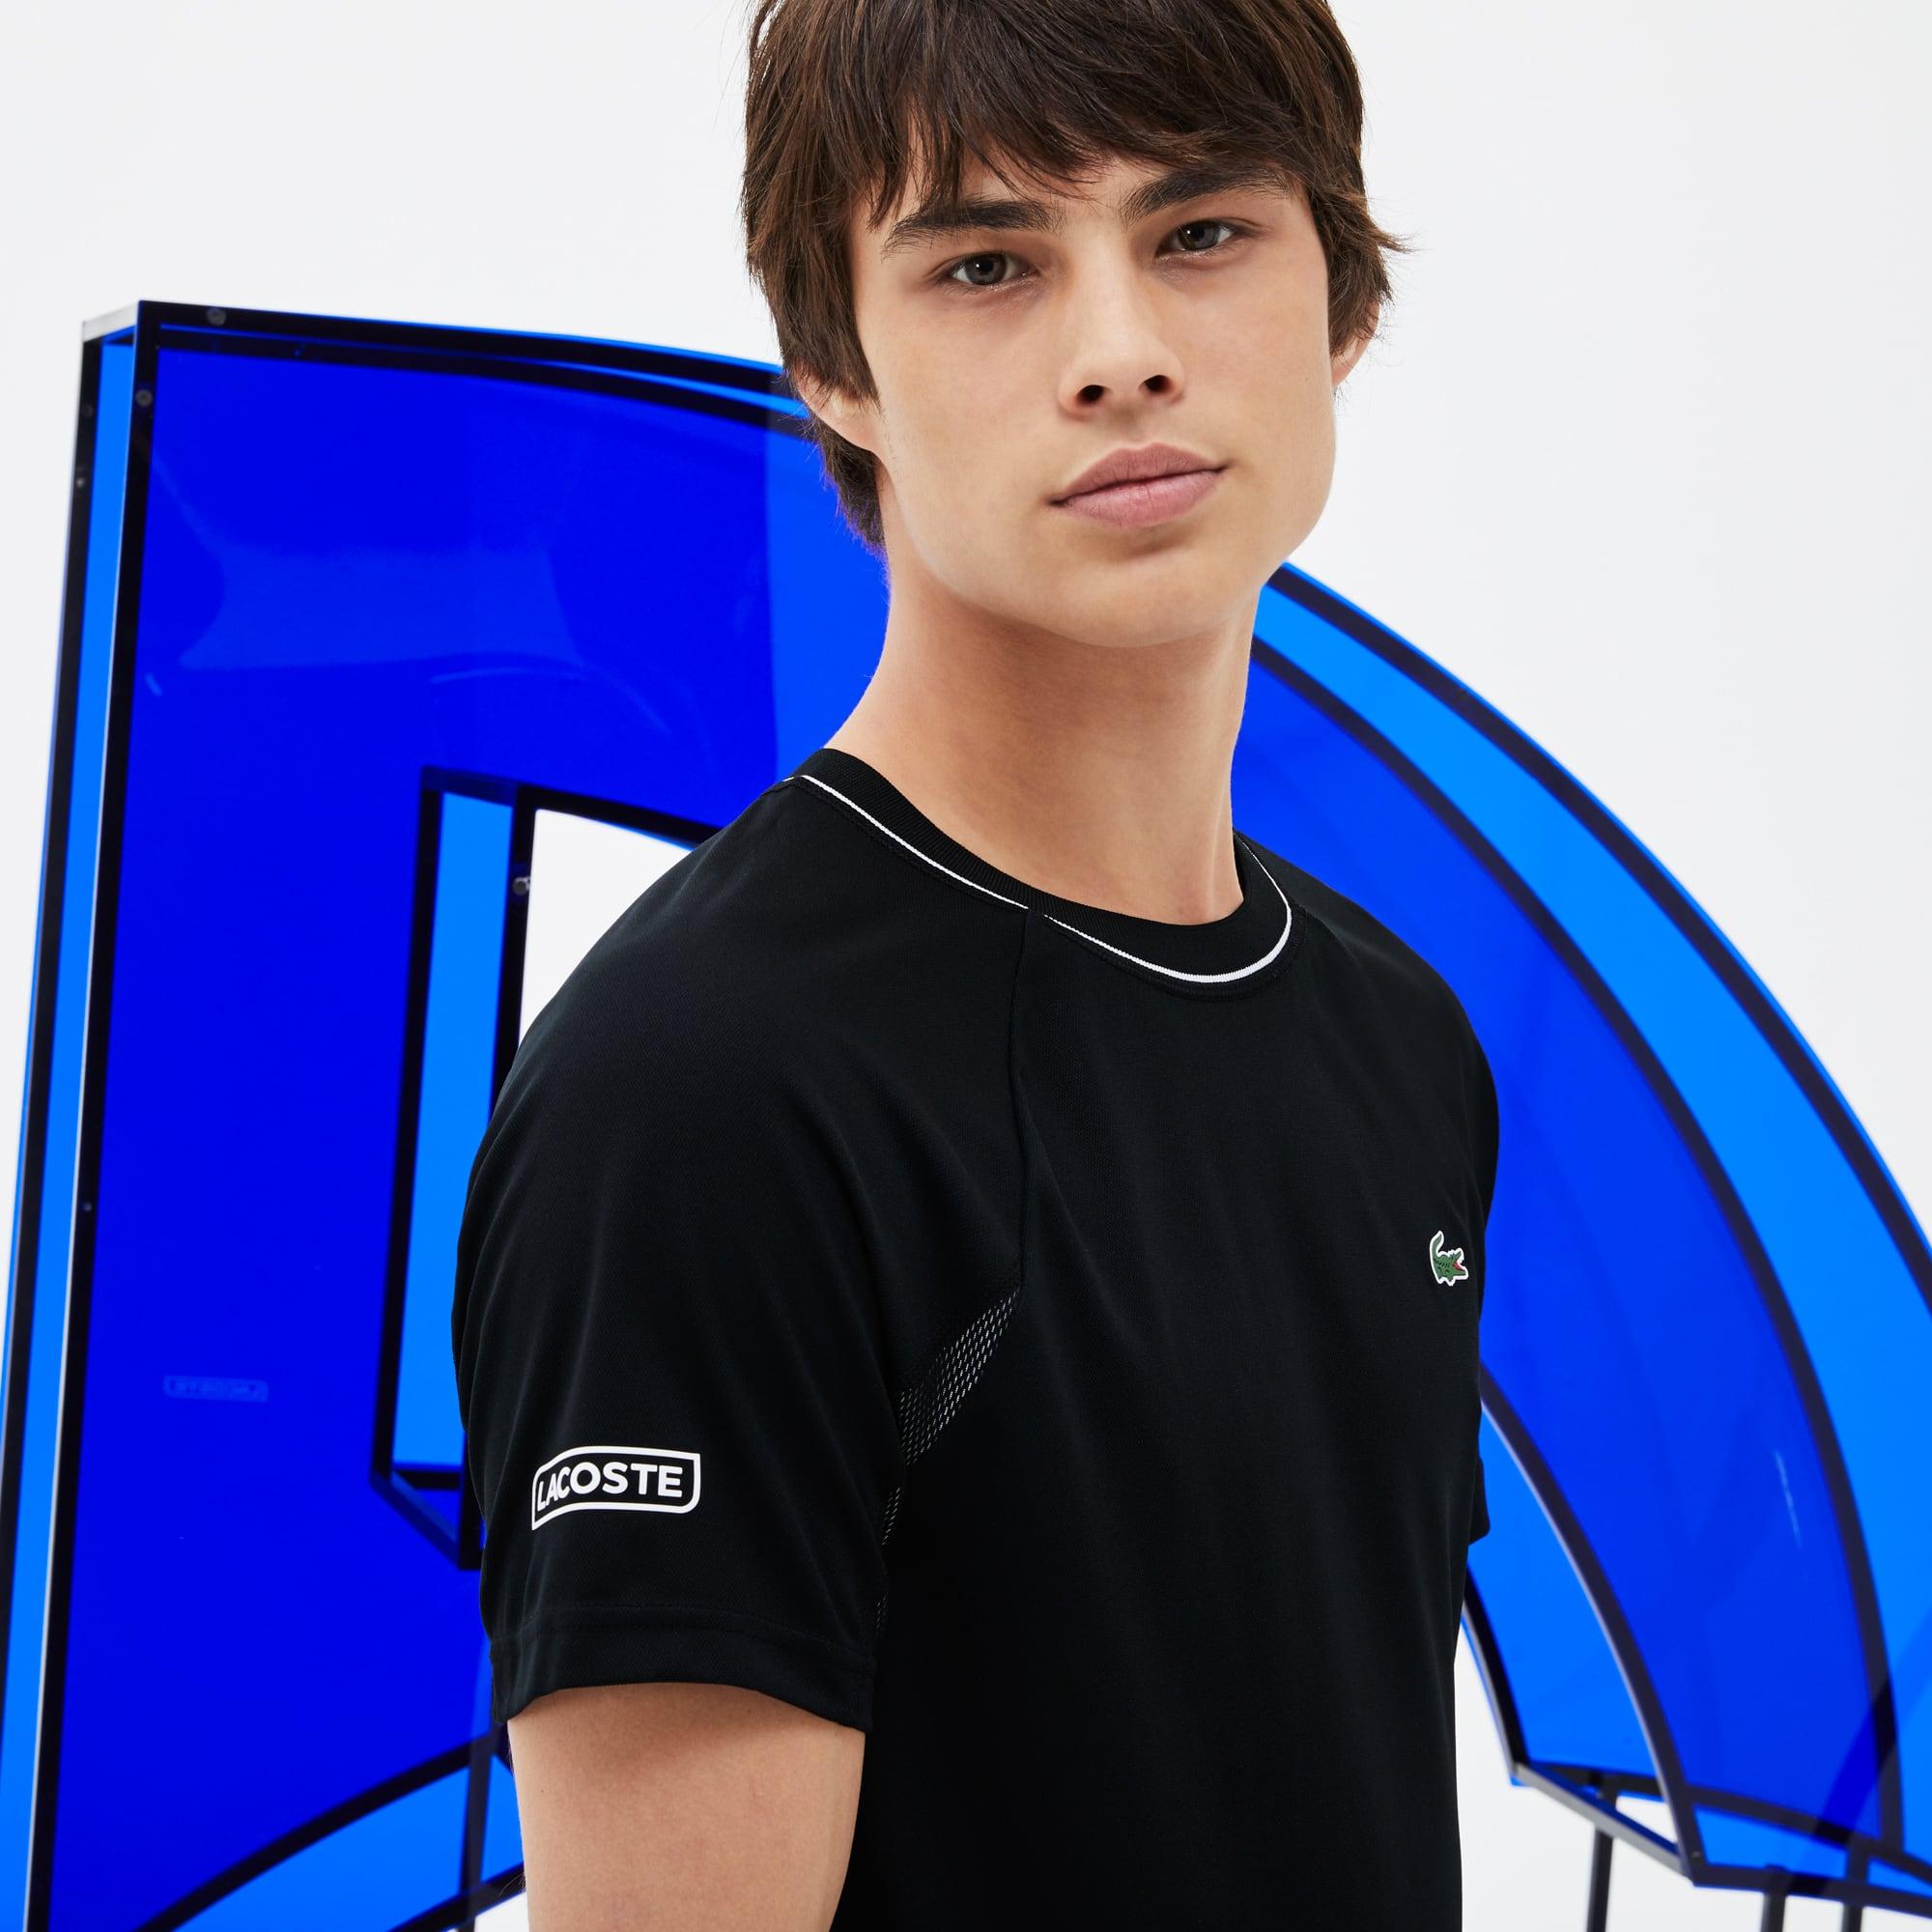 Camiseta cuello redondo Lacoste SPORT COLLECTION NOVAK DJOKOVIC SUPPORT WITH STYLE de piqué técnico y malla